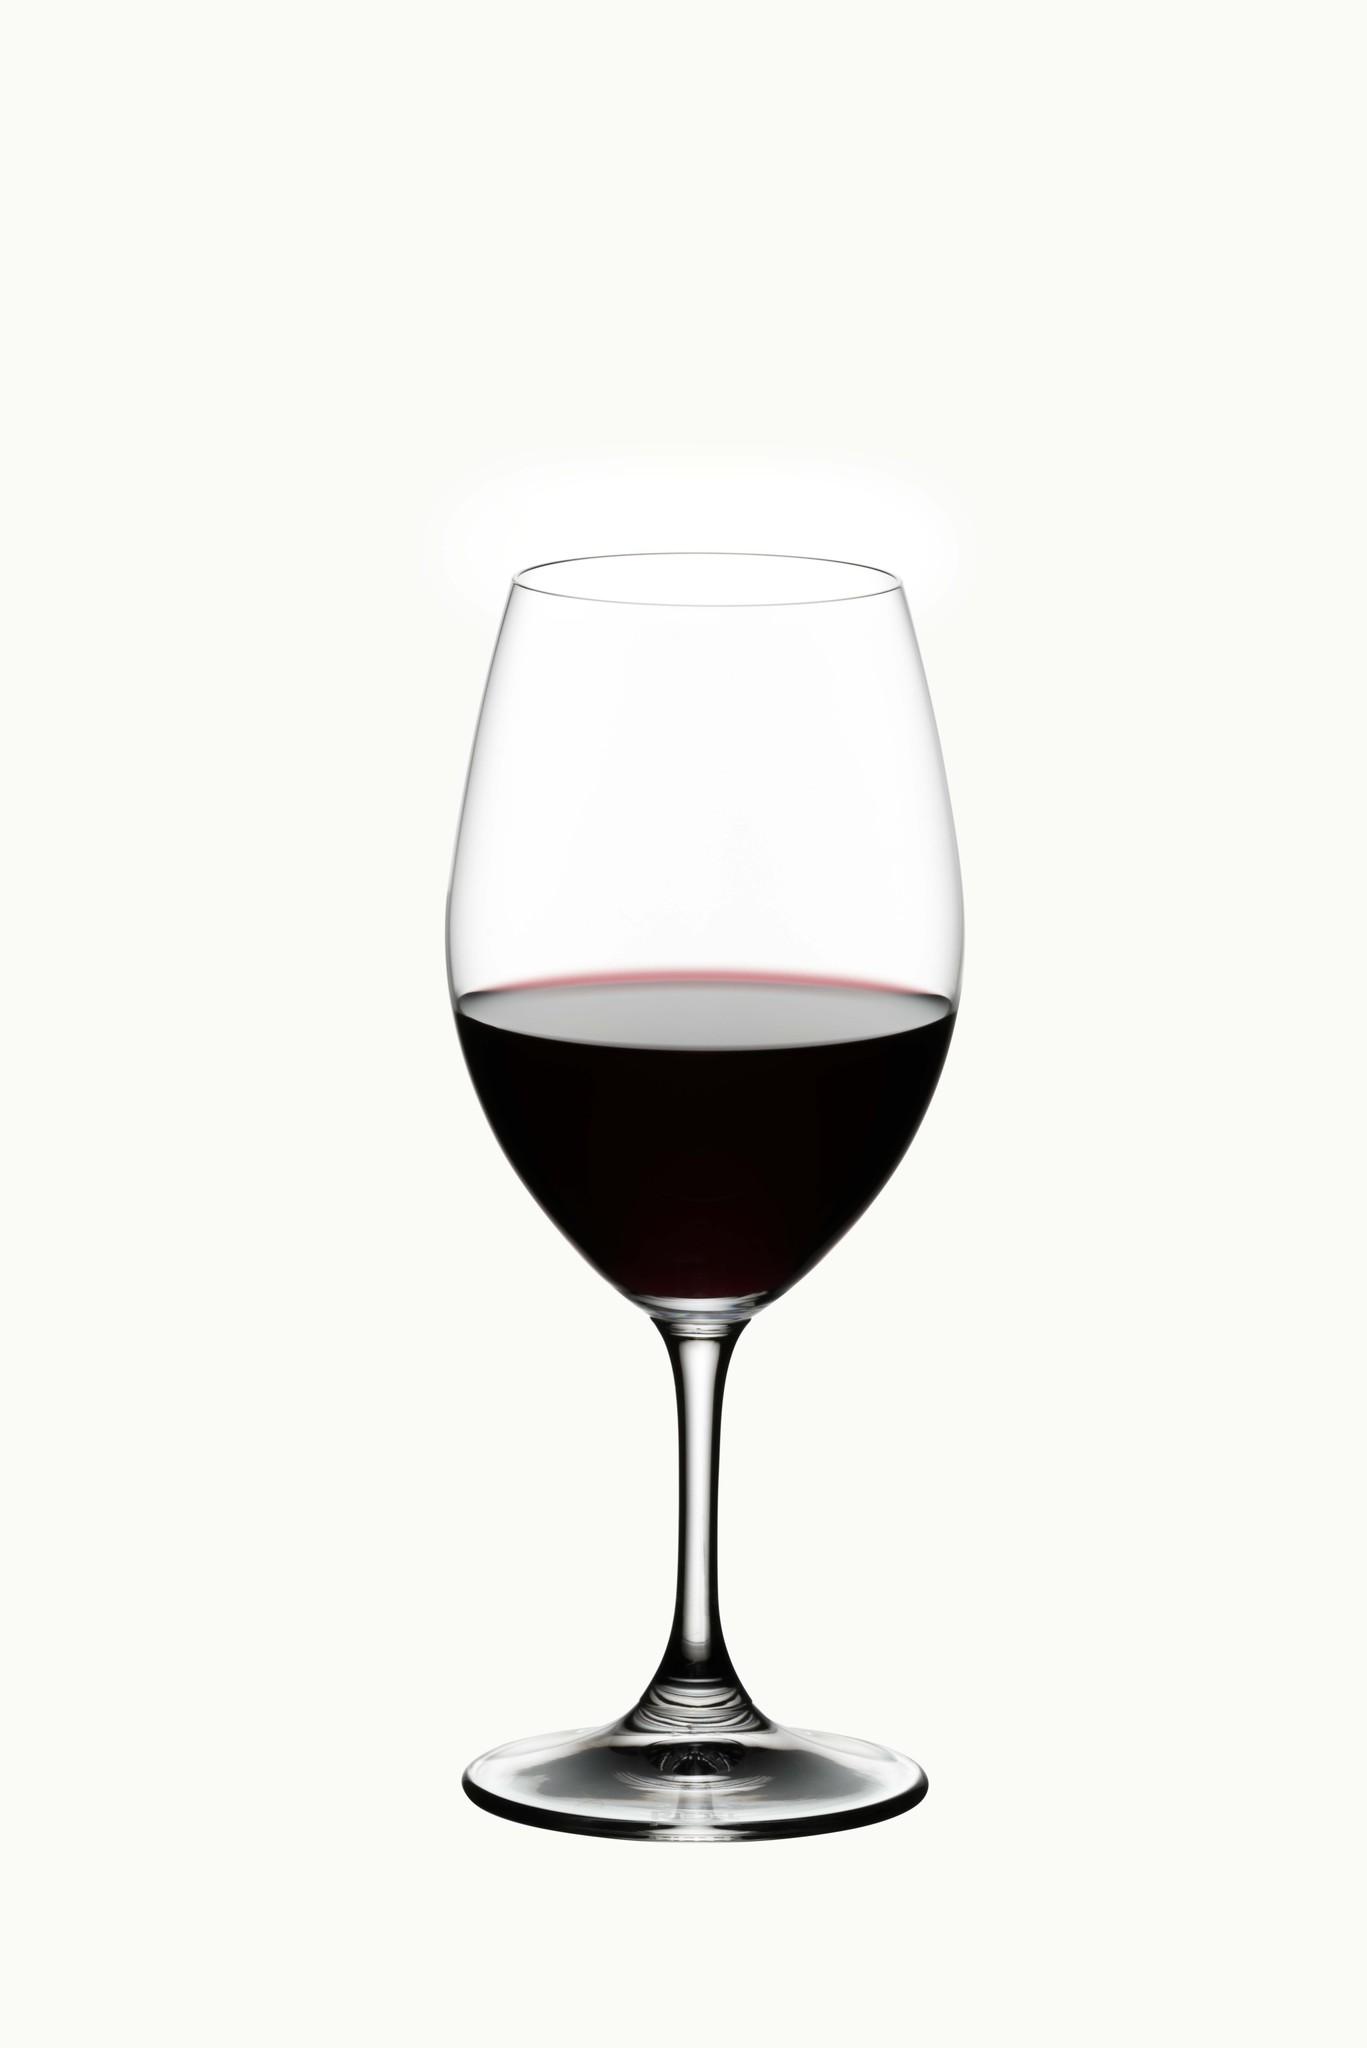 Бокалы Набор бокалов для красного вина 2шт 350мл Riedel Ouverture Red Wine nabor-bokalov-dlya-krasnogo-vina-2sht-350ml-riedel-ouverture-red-wine-avstriya.jpg